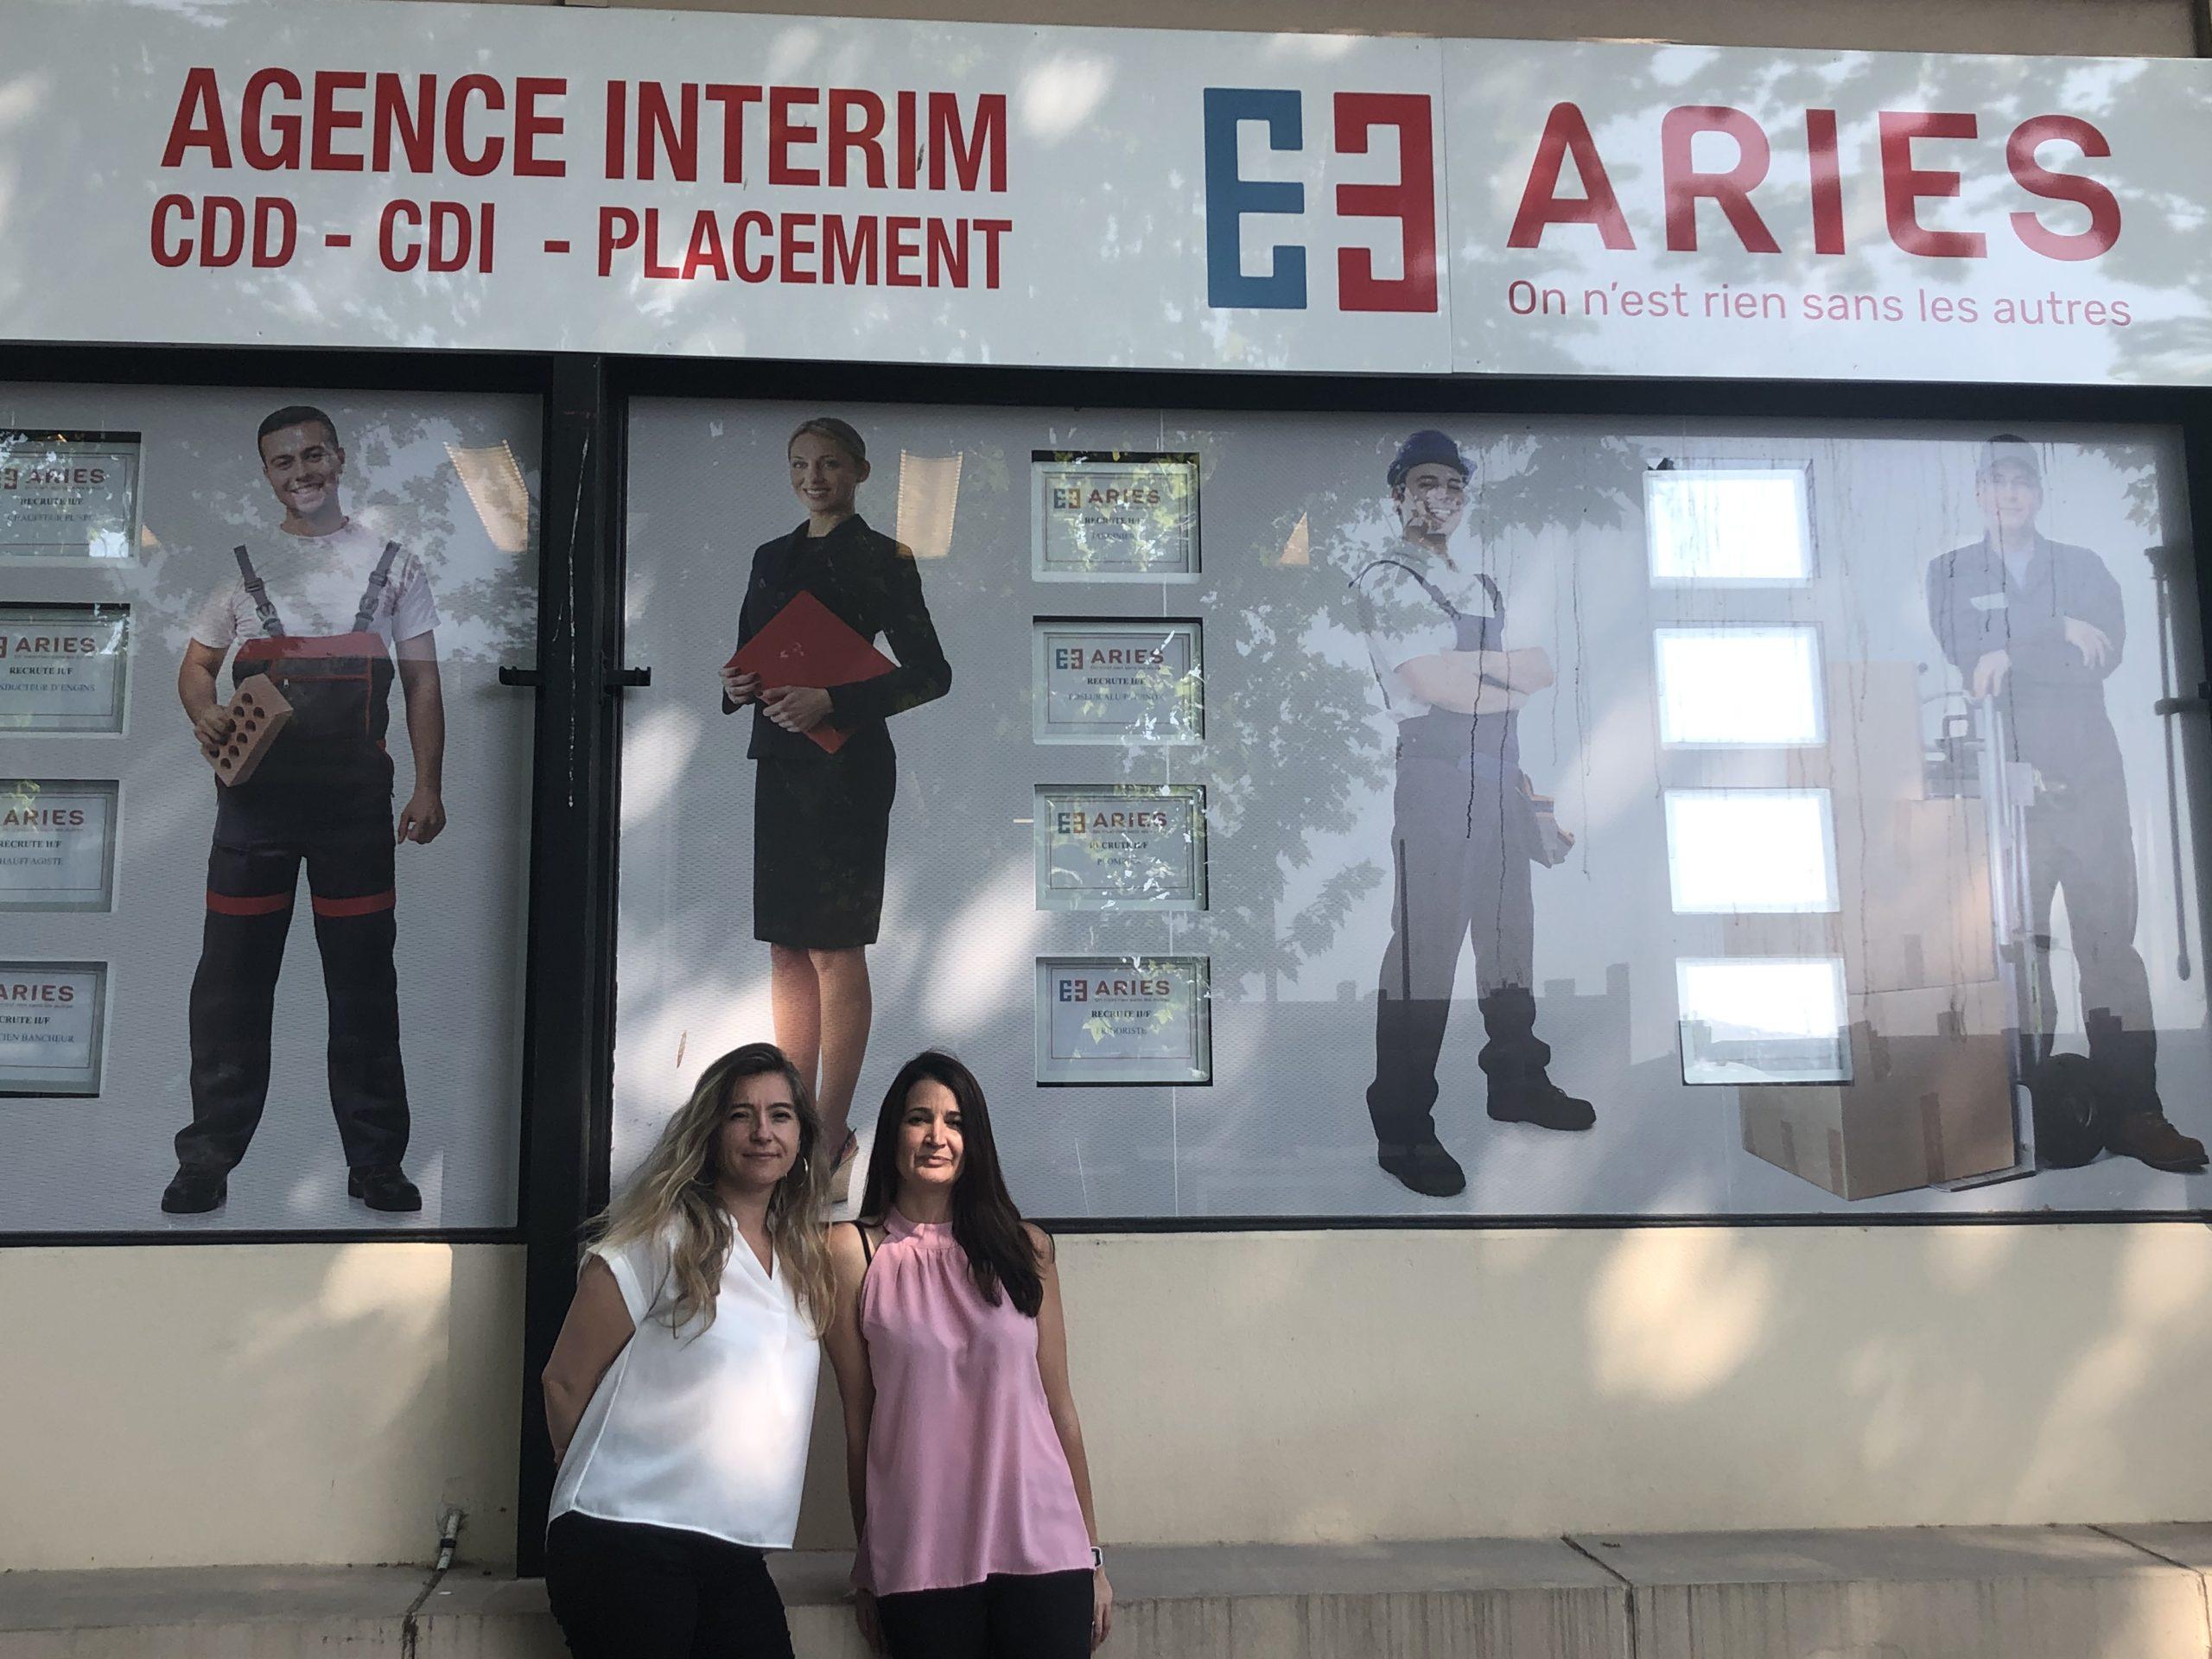 Aries interim Fréjus - équipe